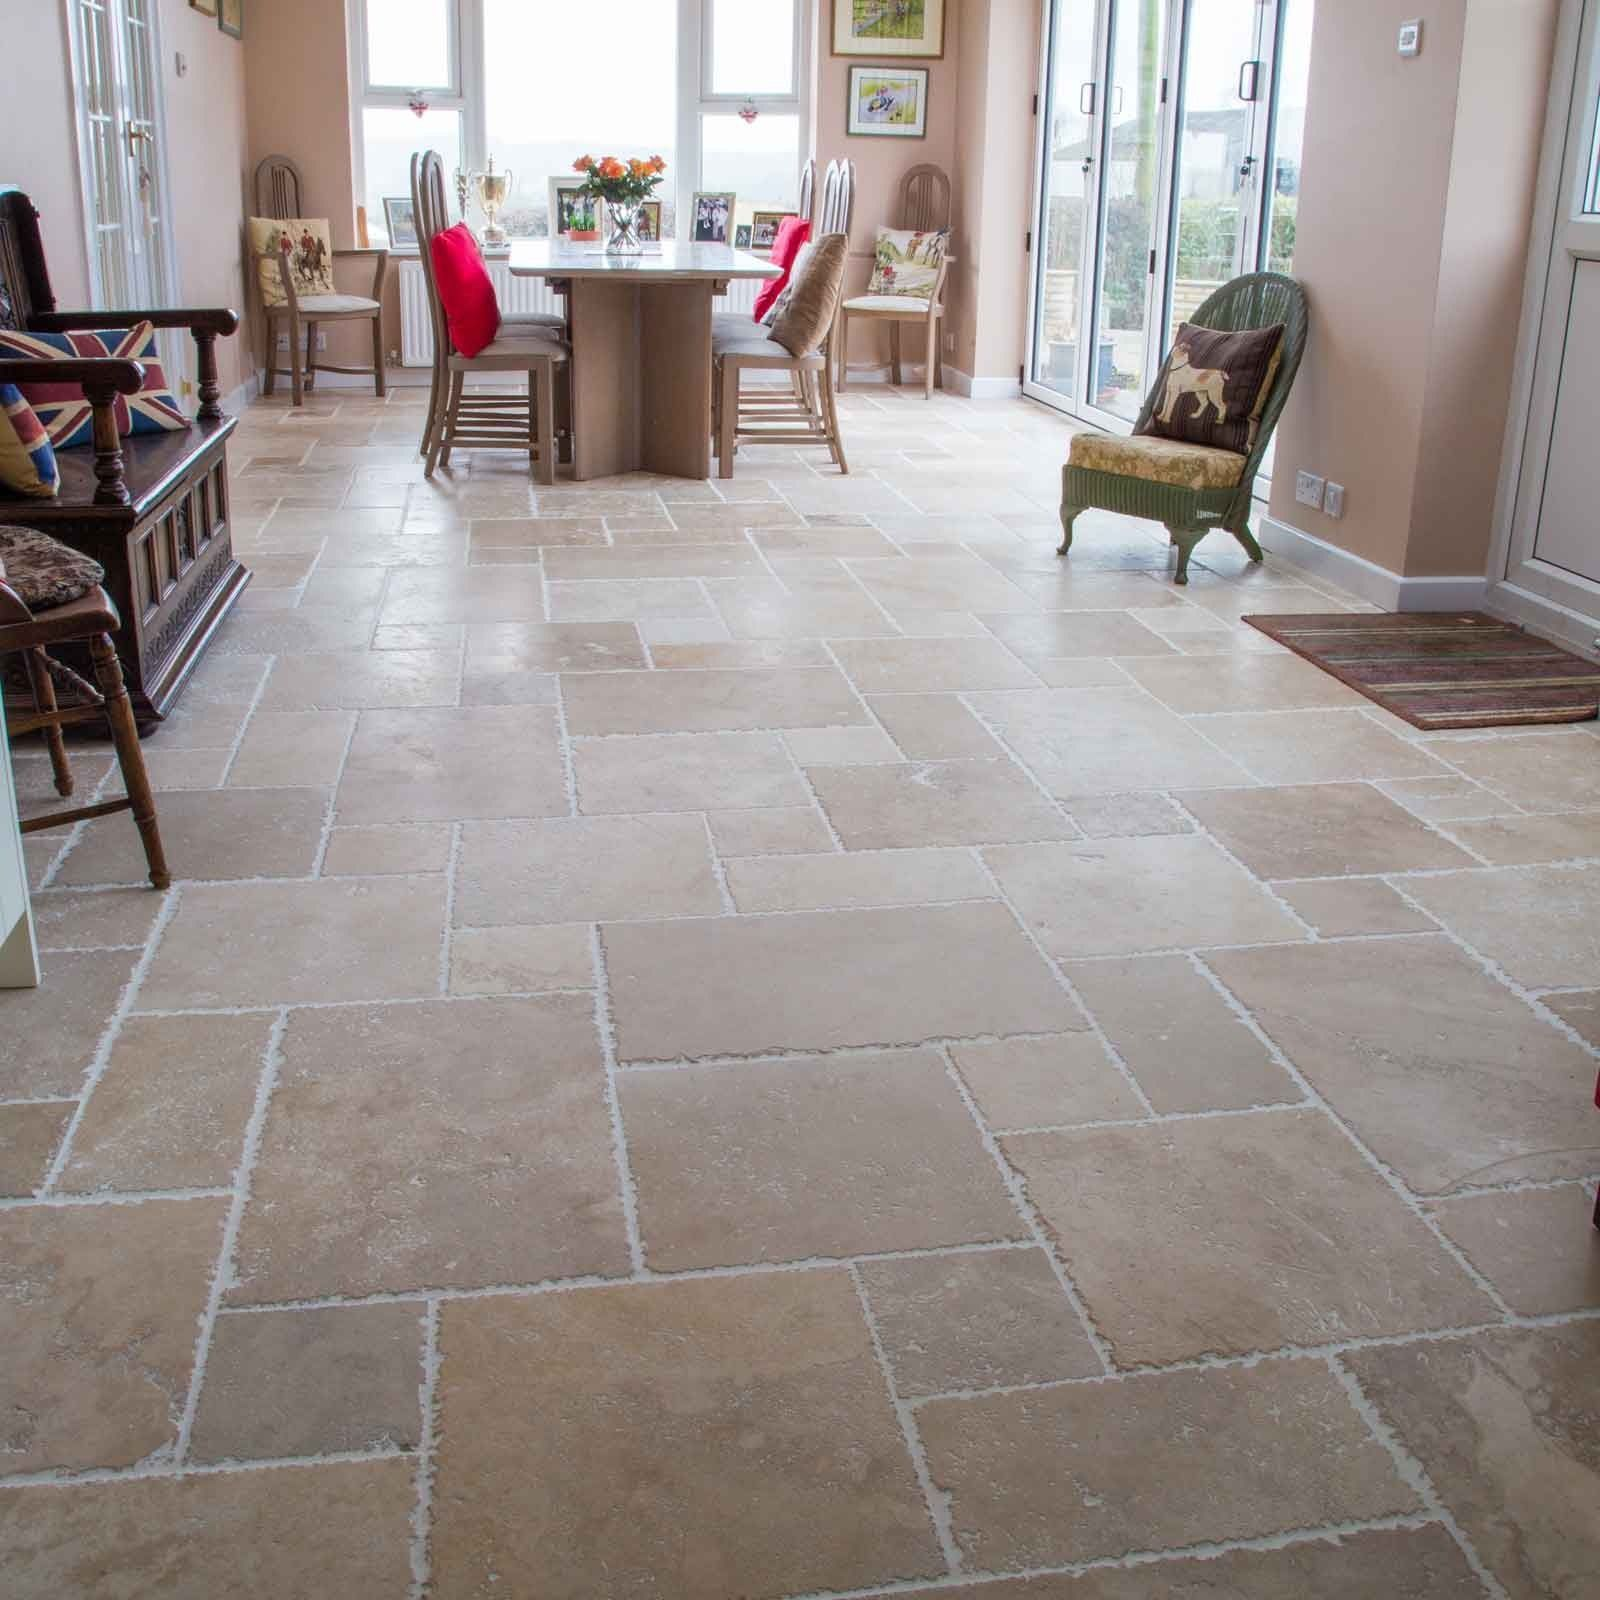 Classic aegean brushed travertine floor tiles natural